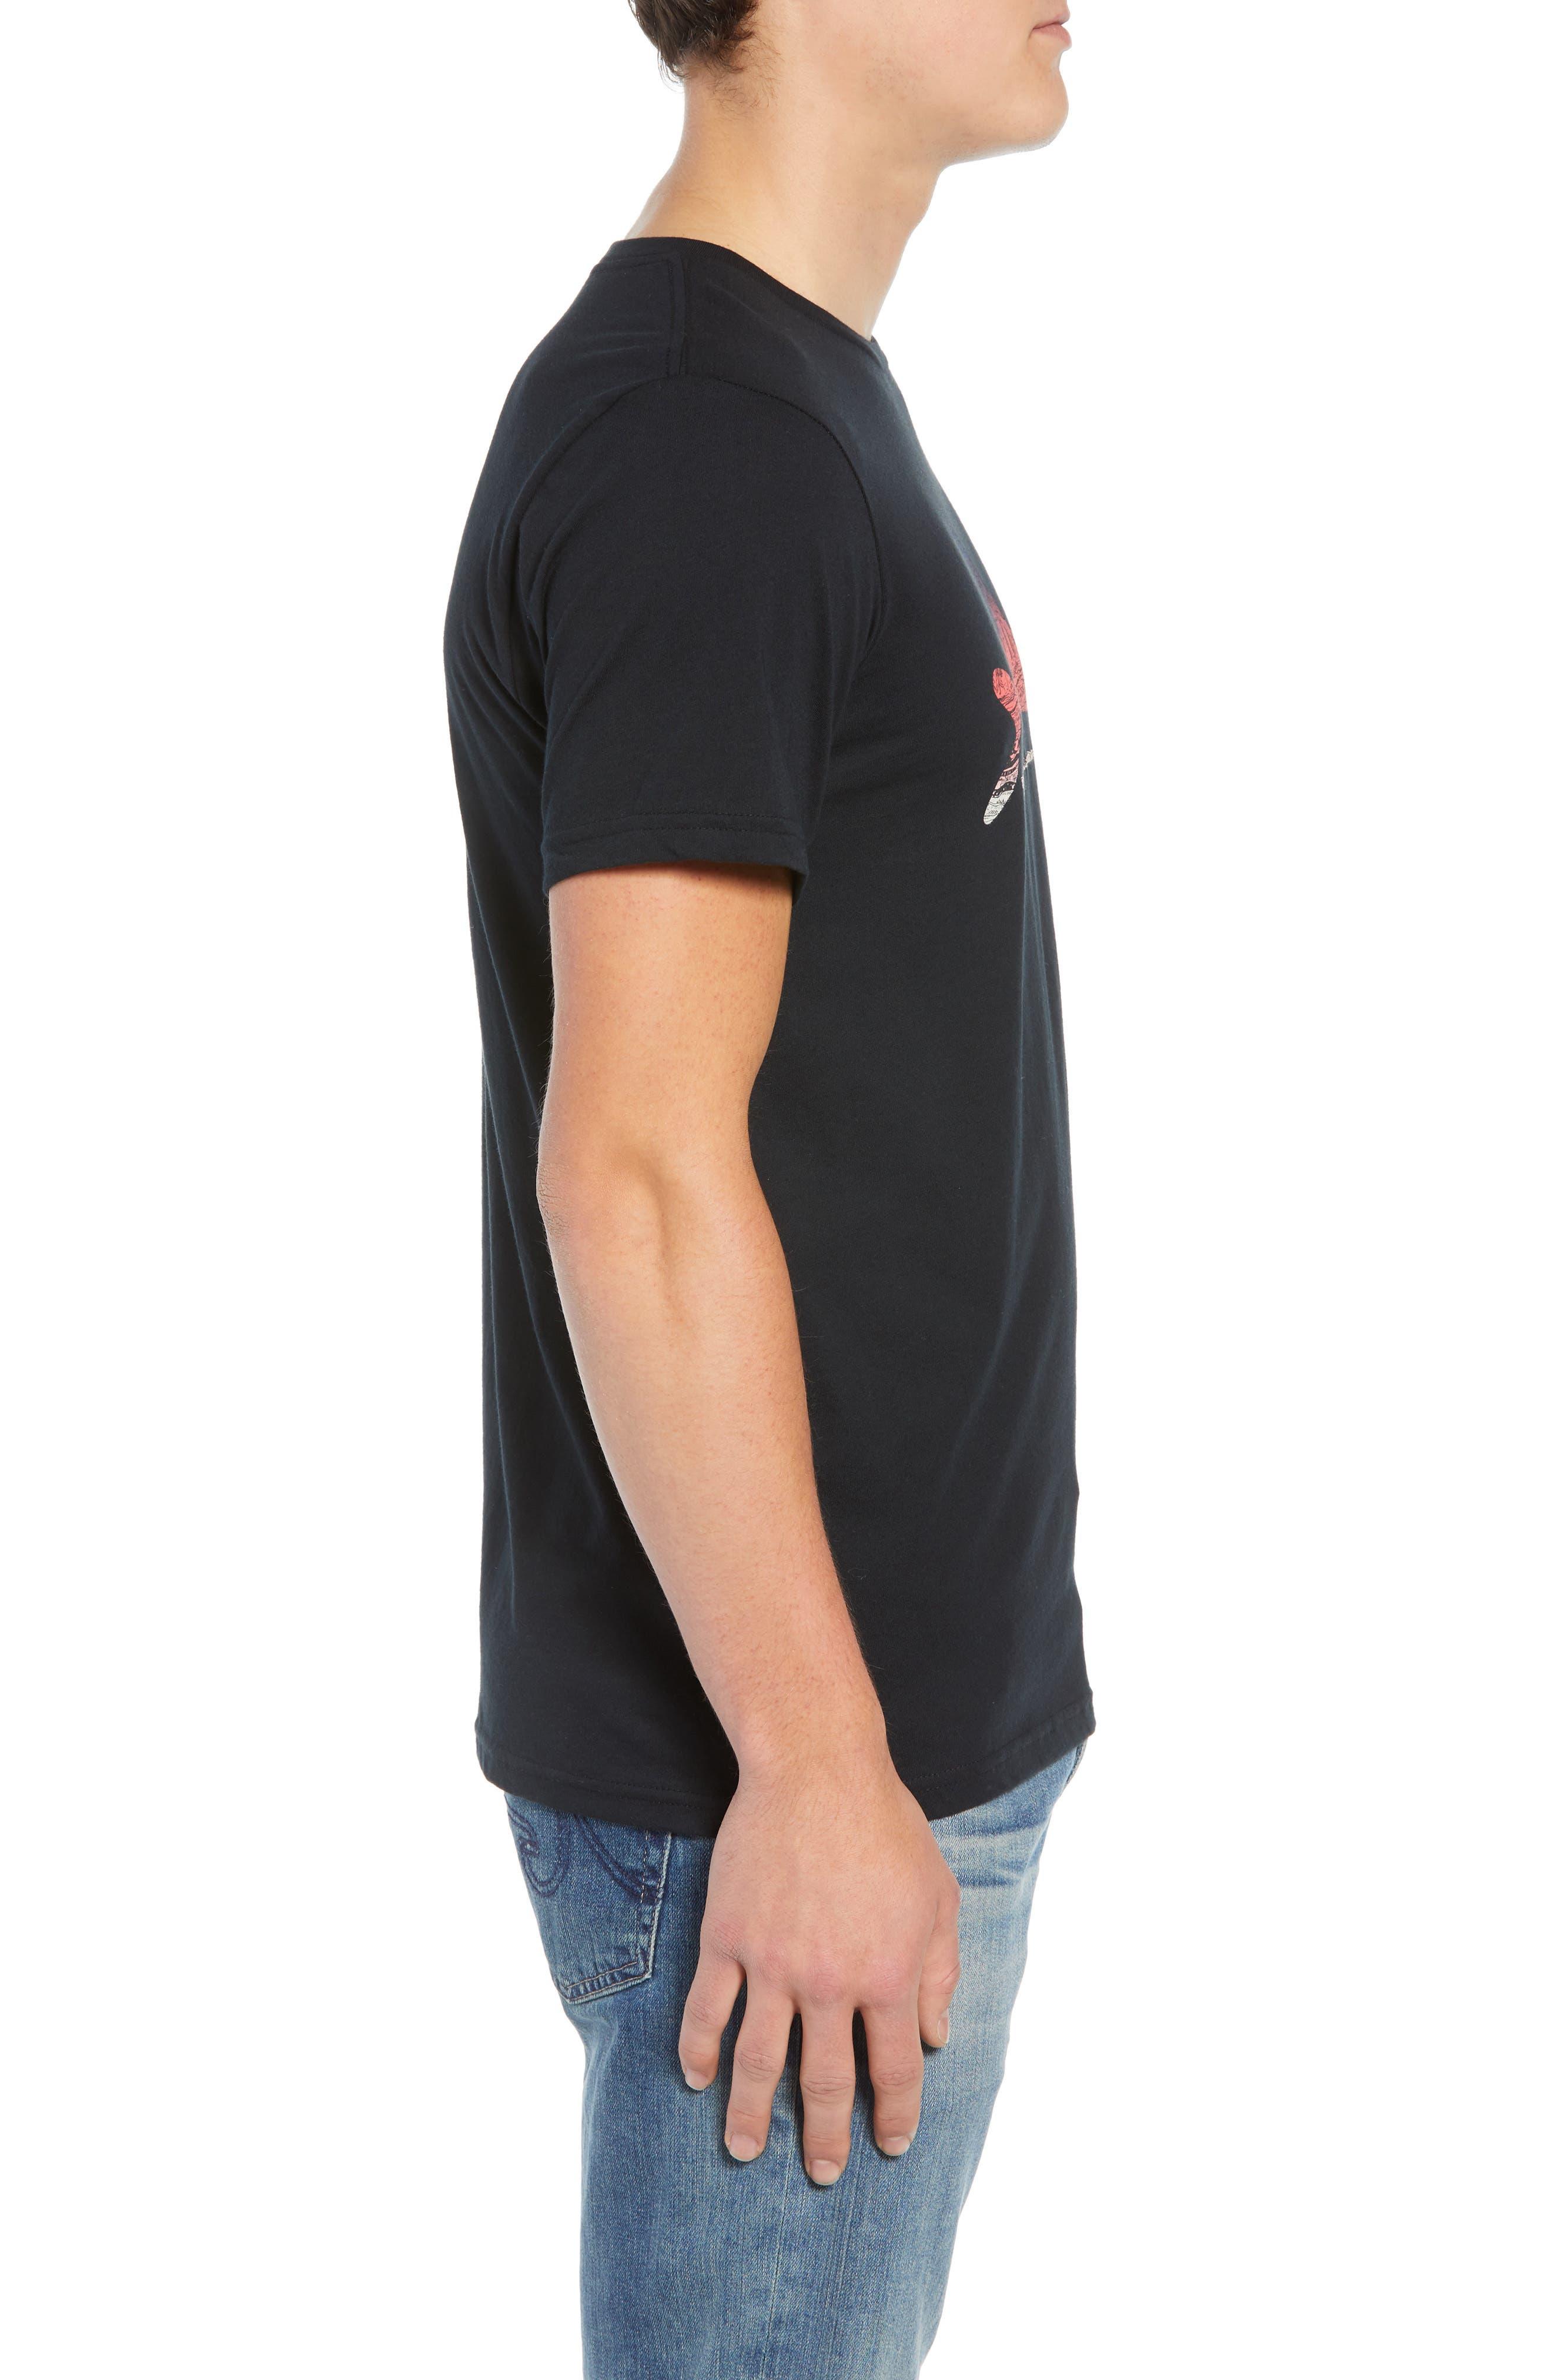 Flying Fish Organic Cotton T-Shirt,                             Alternate thumbnail 3, color,                             BLACK/ ALBANIAN LANDSCAPE